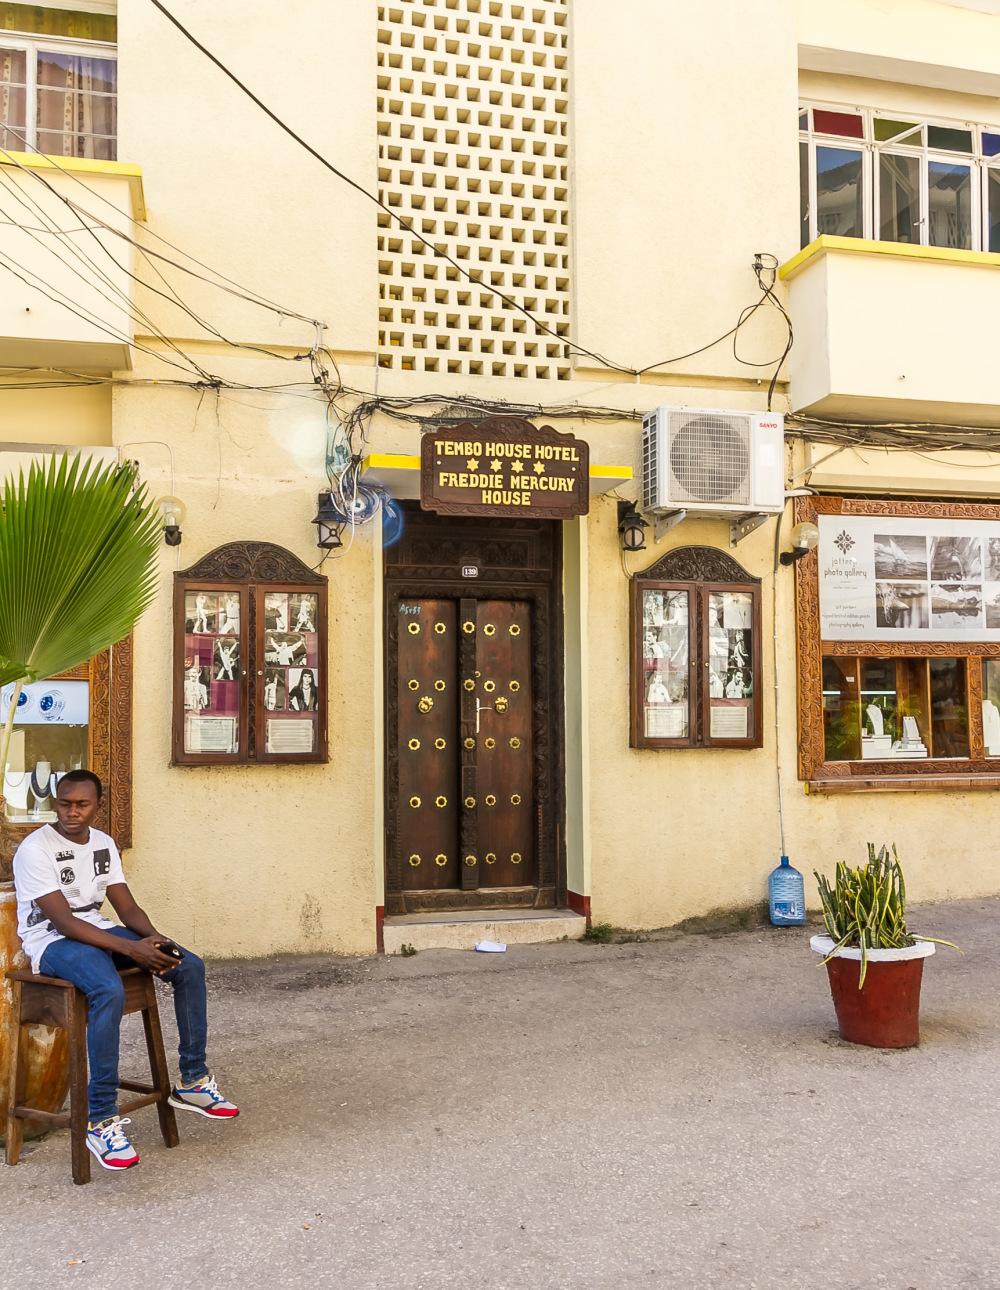 #4 Zanzibar -Freddy Mercury House